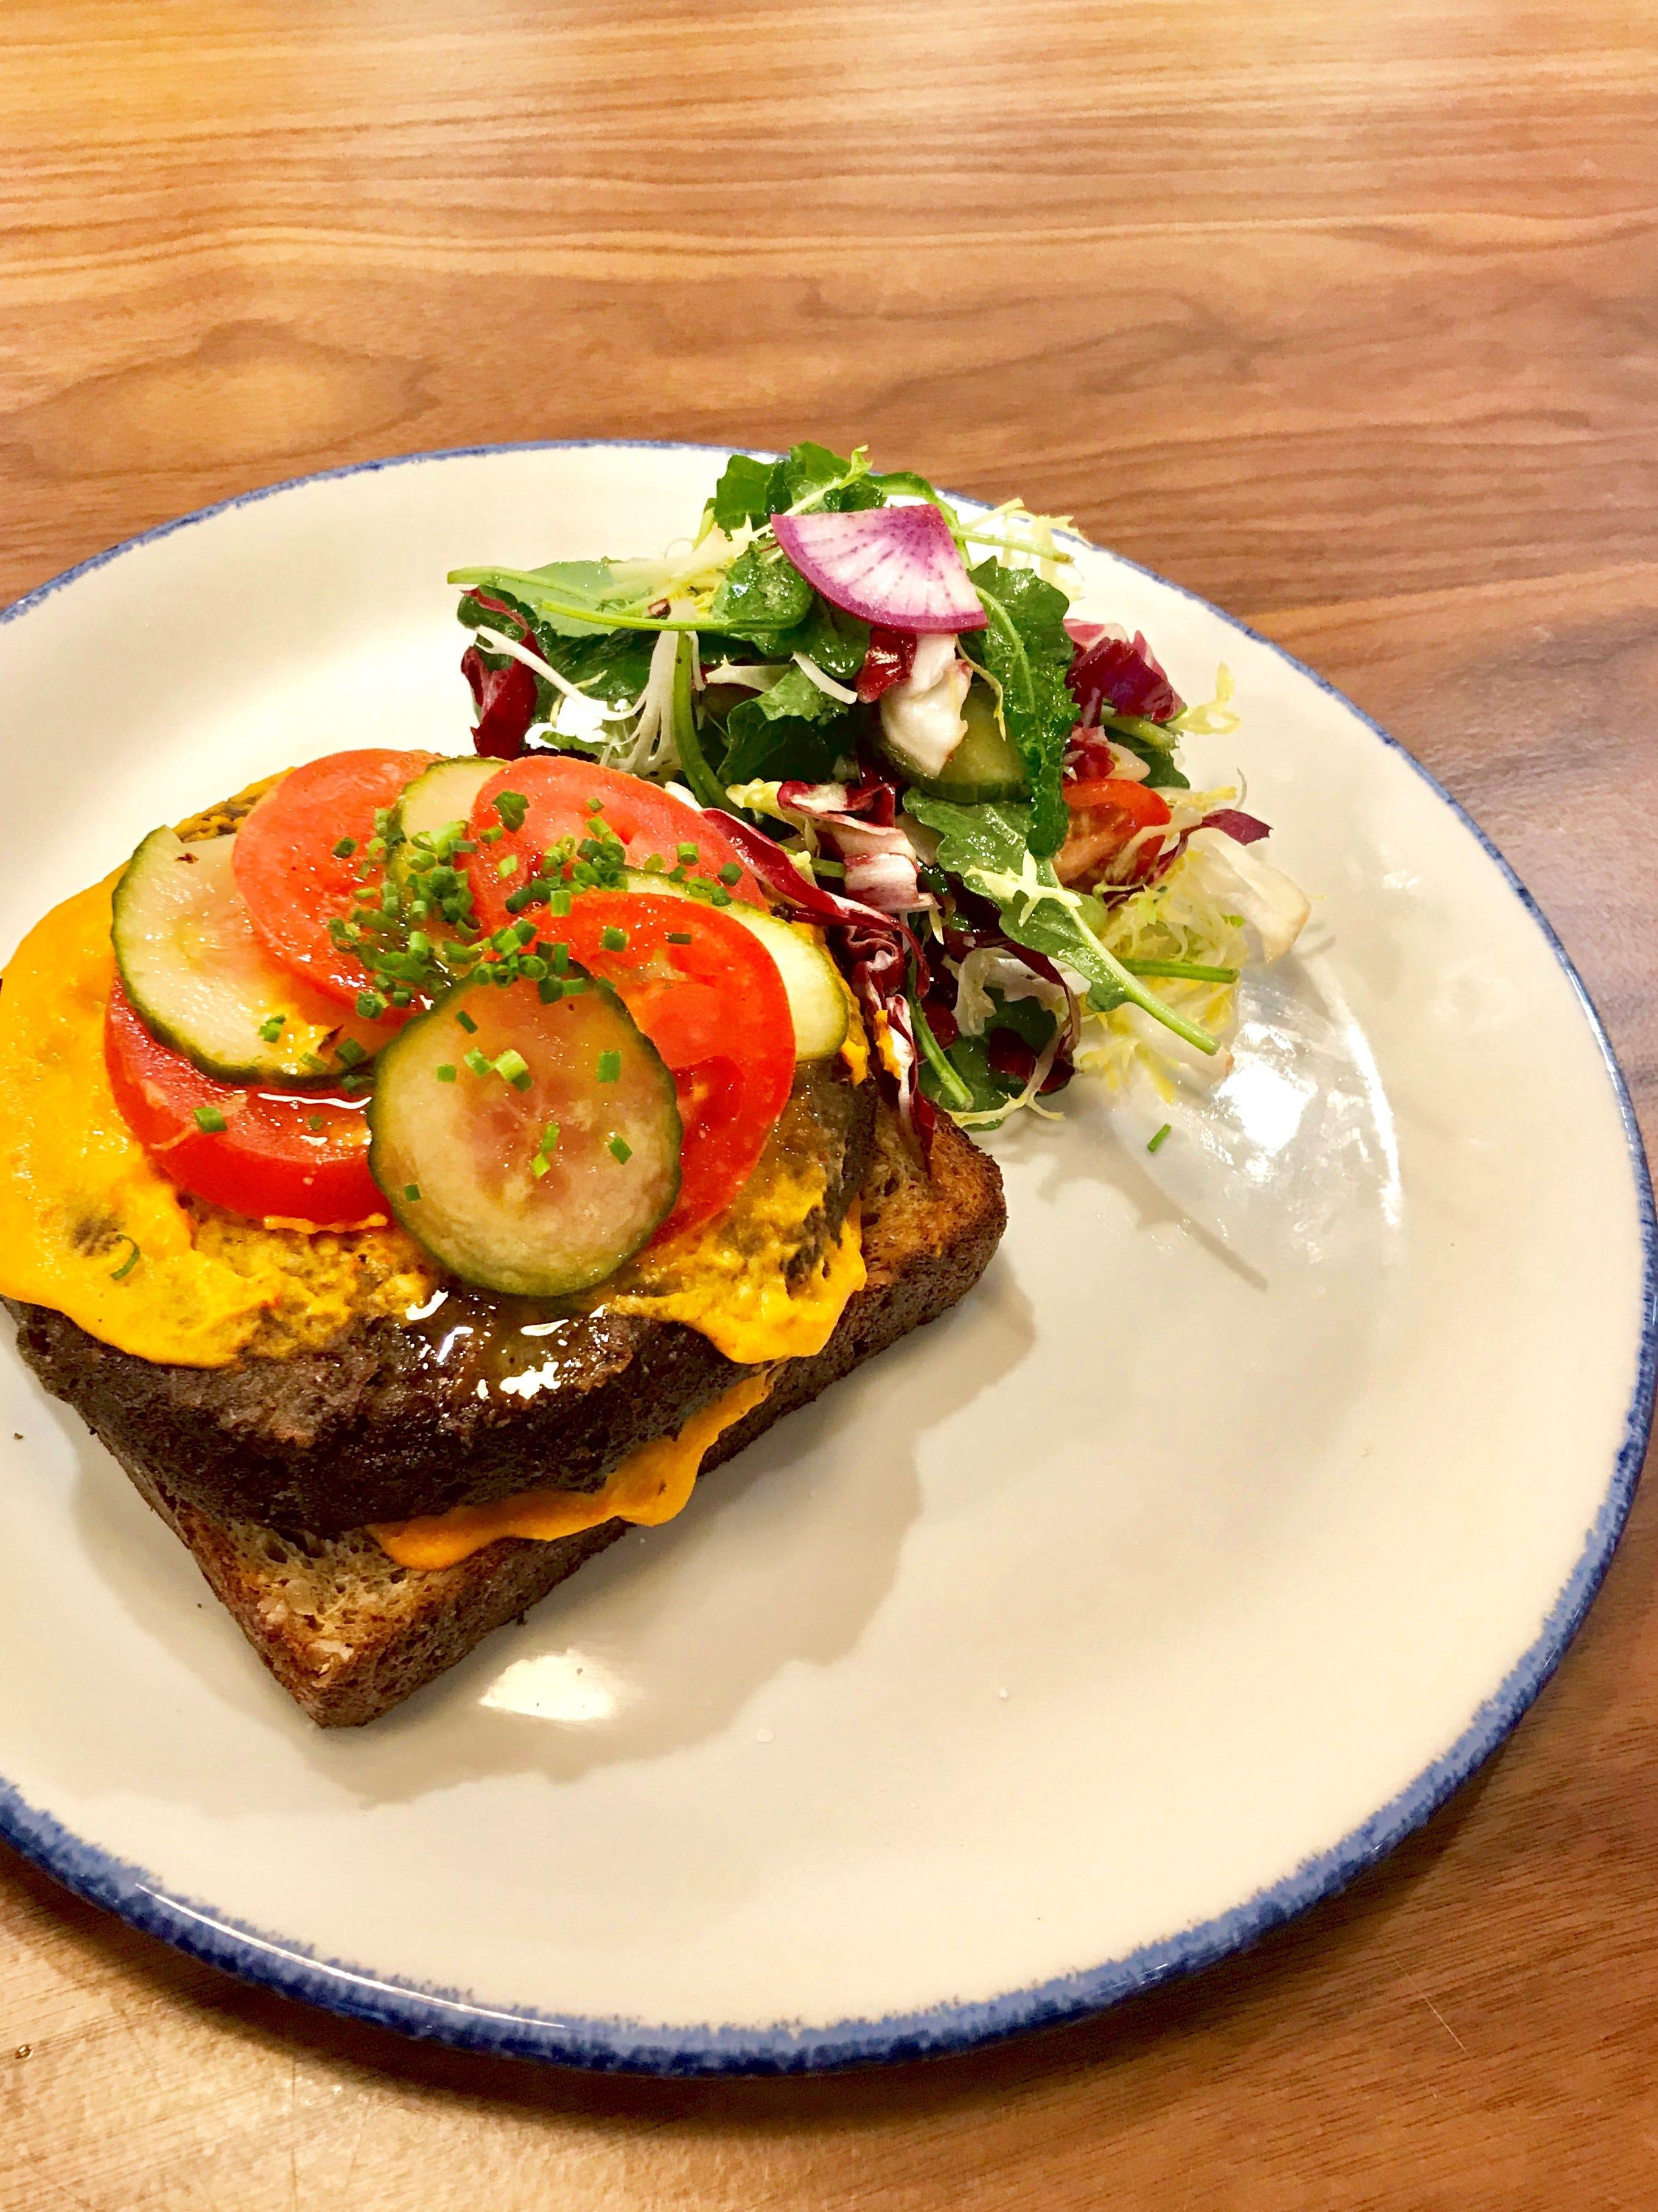 Celebrity Beauty: Saddle River Cafe to provide dinner beginning Feb. 5